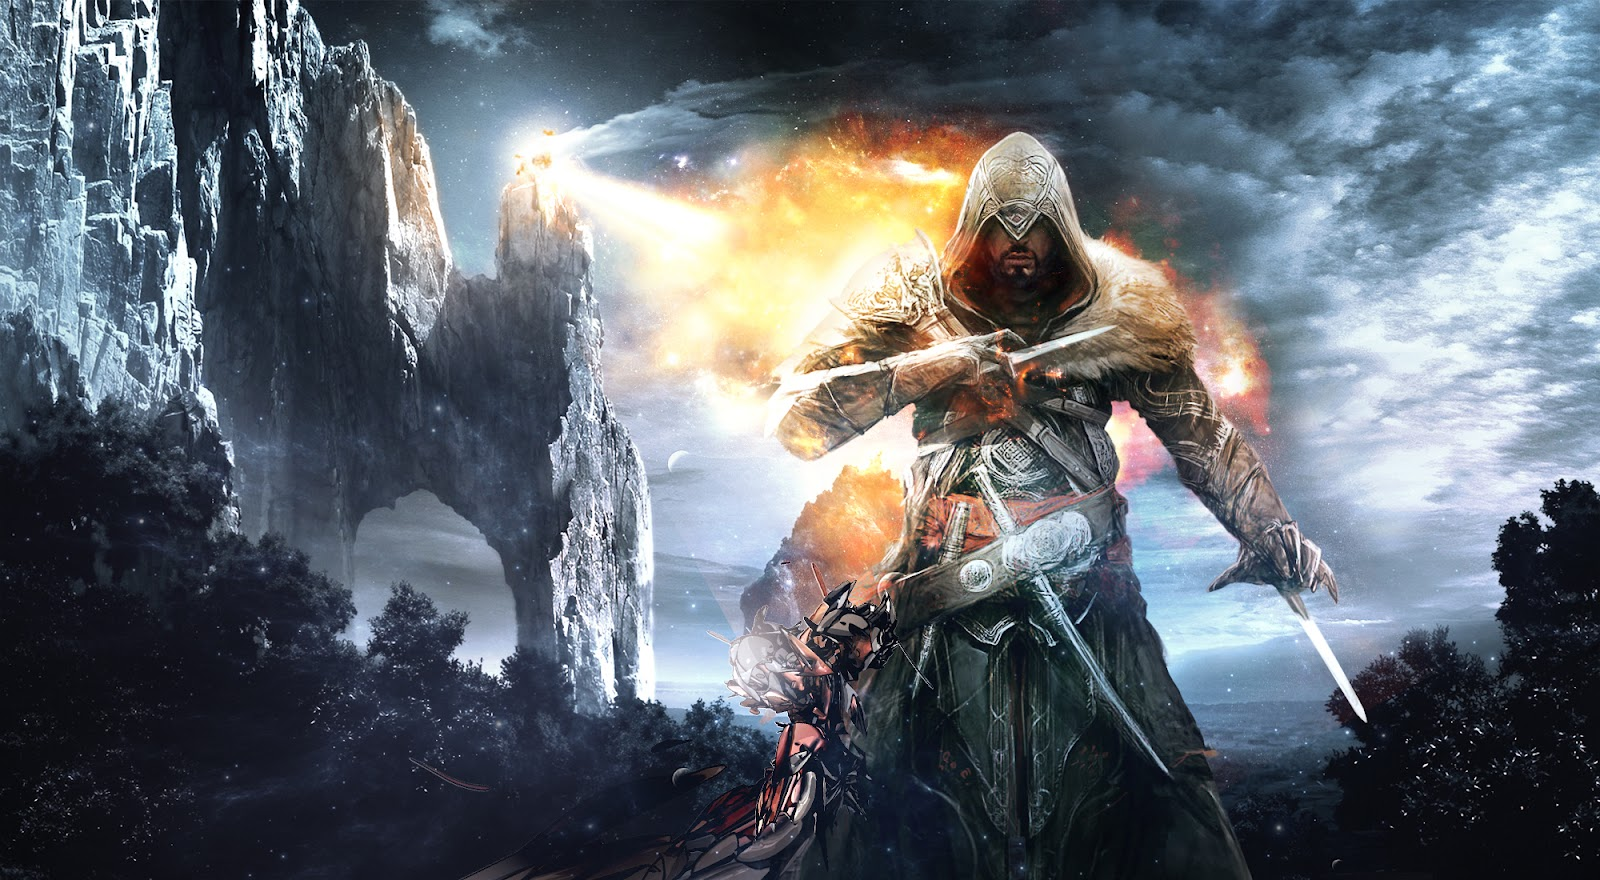 Assassin Creed III HD Wallpaper 1080p PiCsHoliC 1600x880